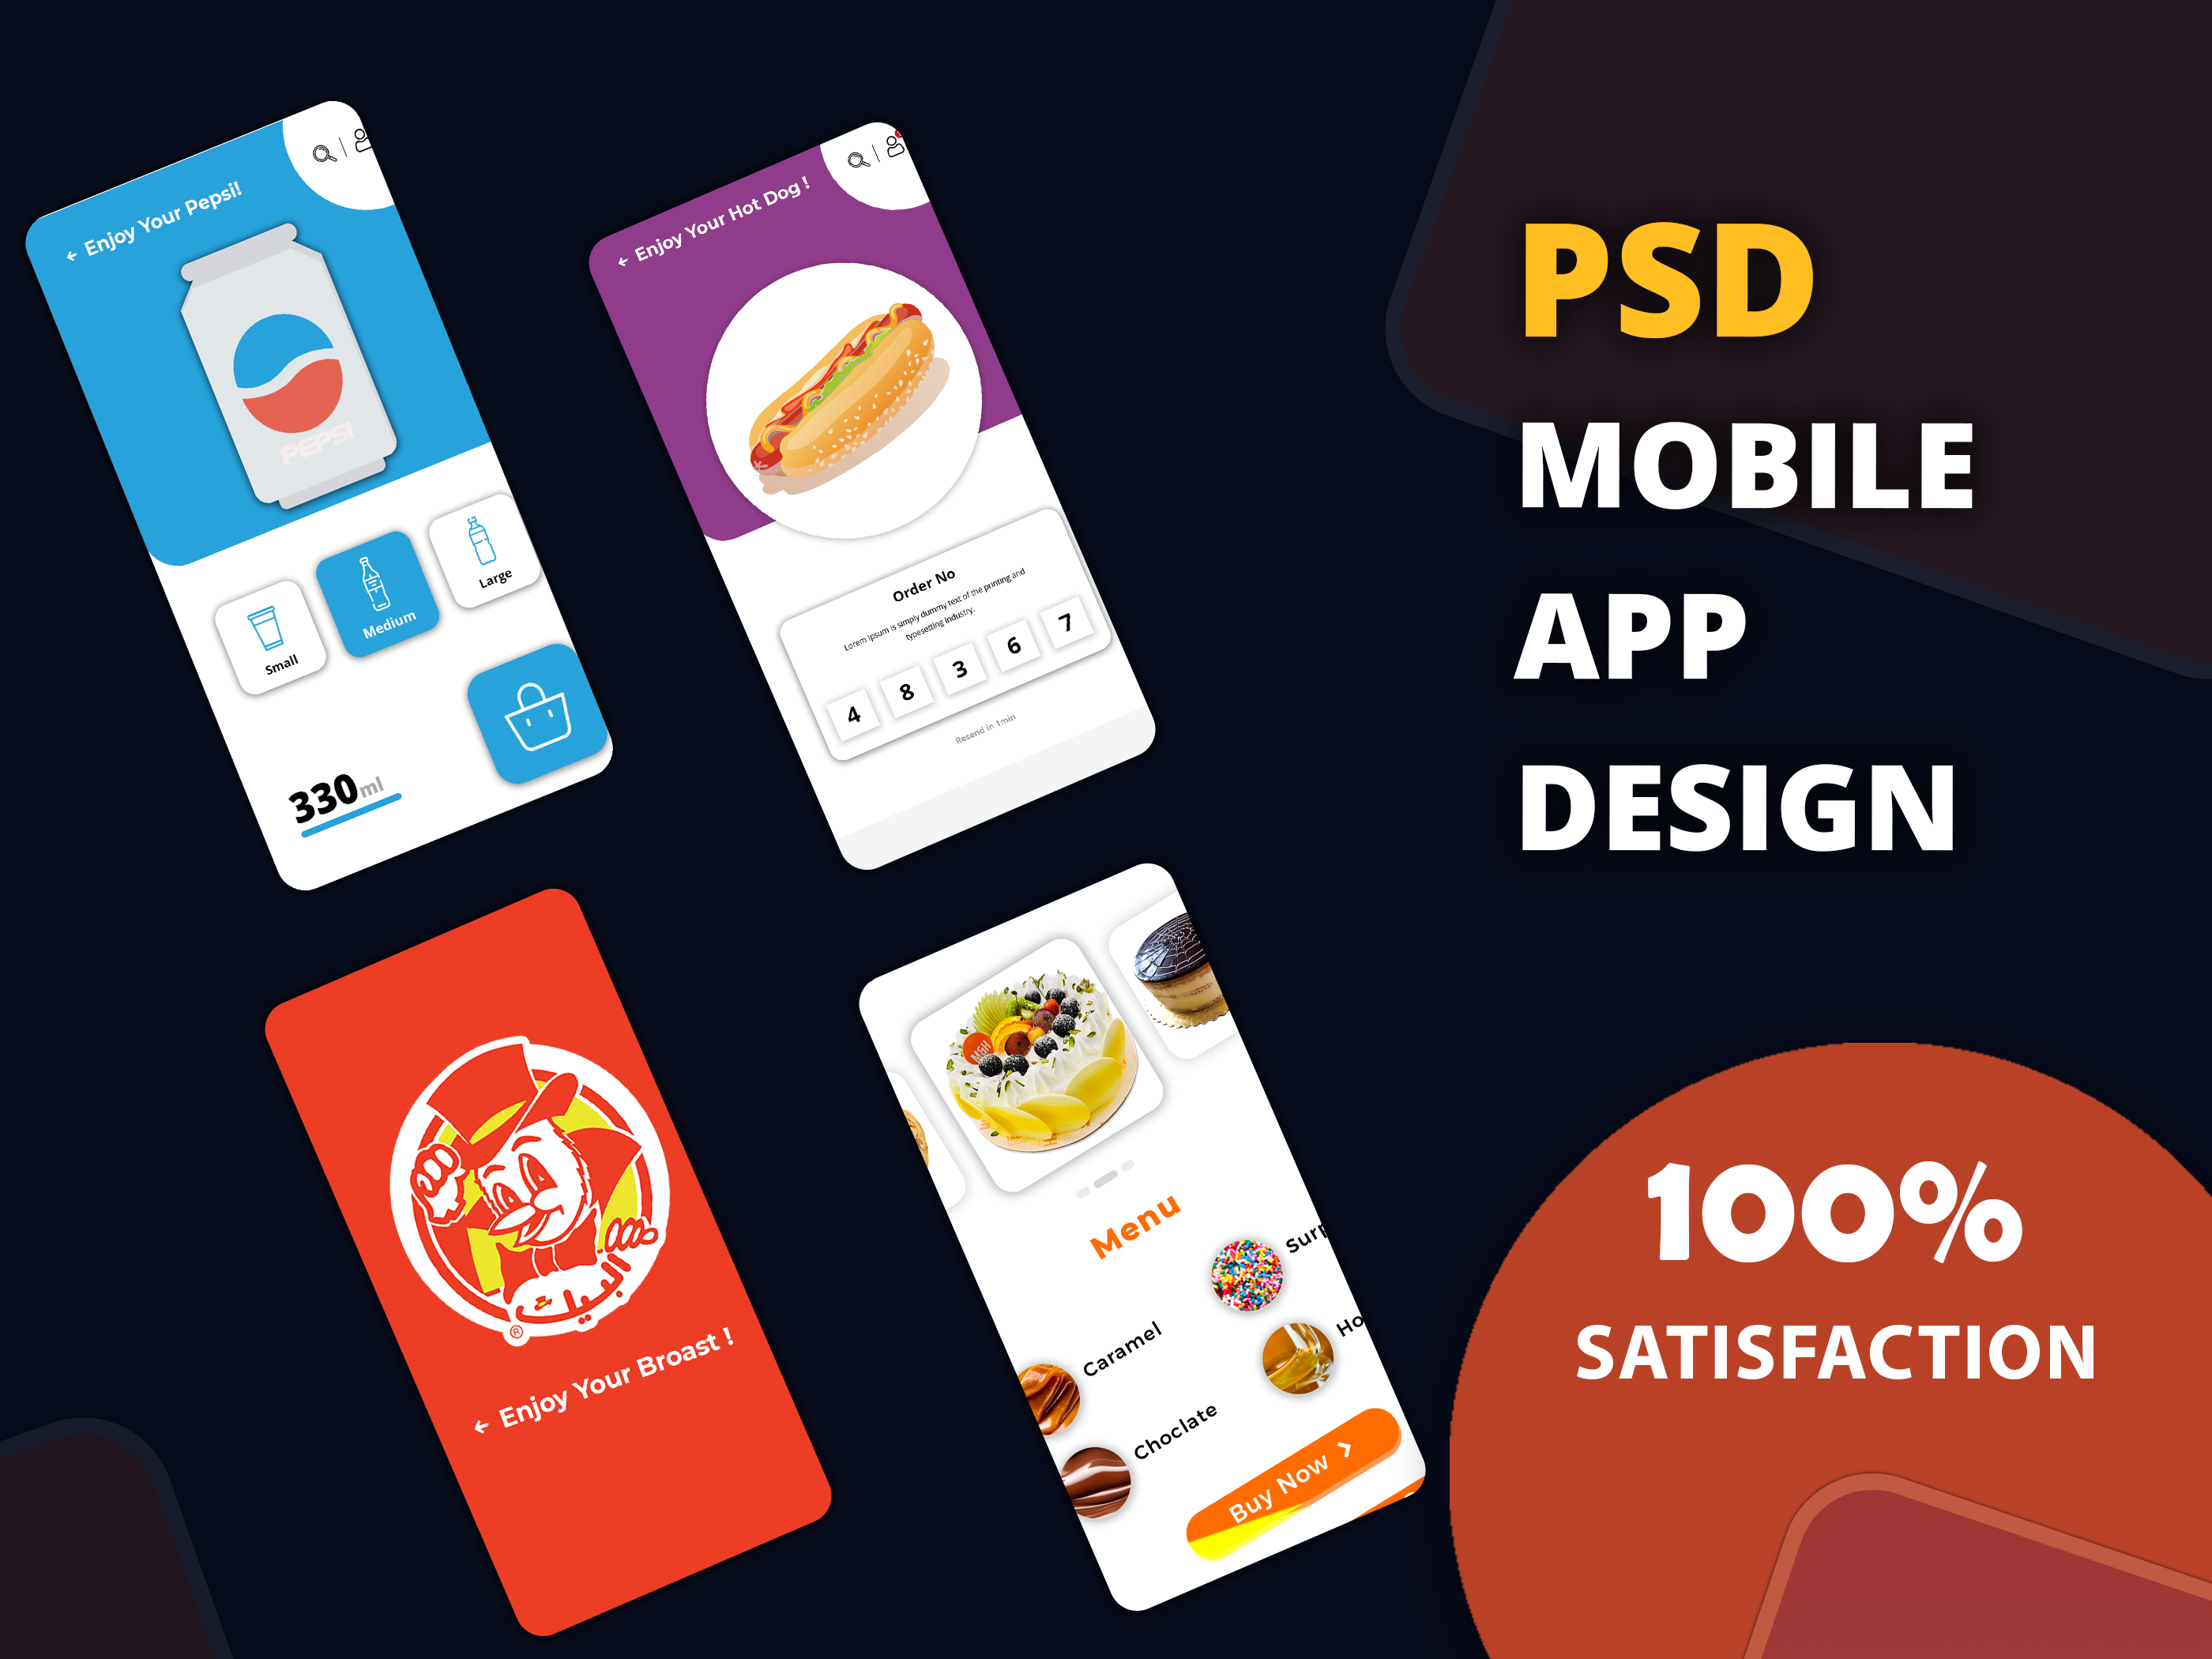 I Will design modern PSD mobile app UI, UX screen or app mockup